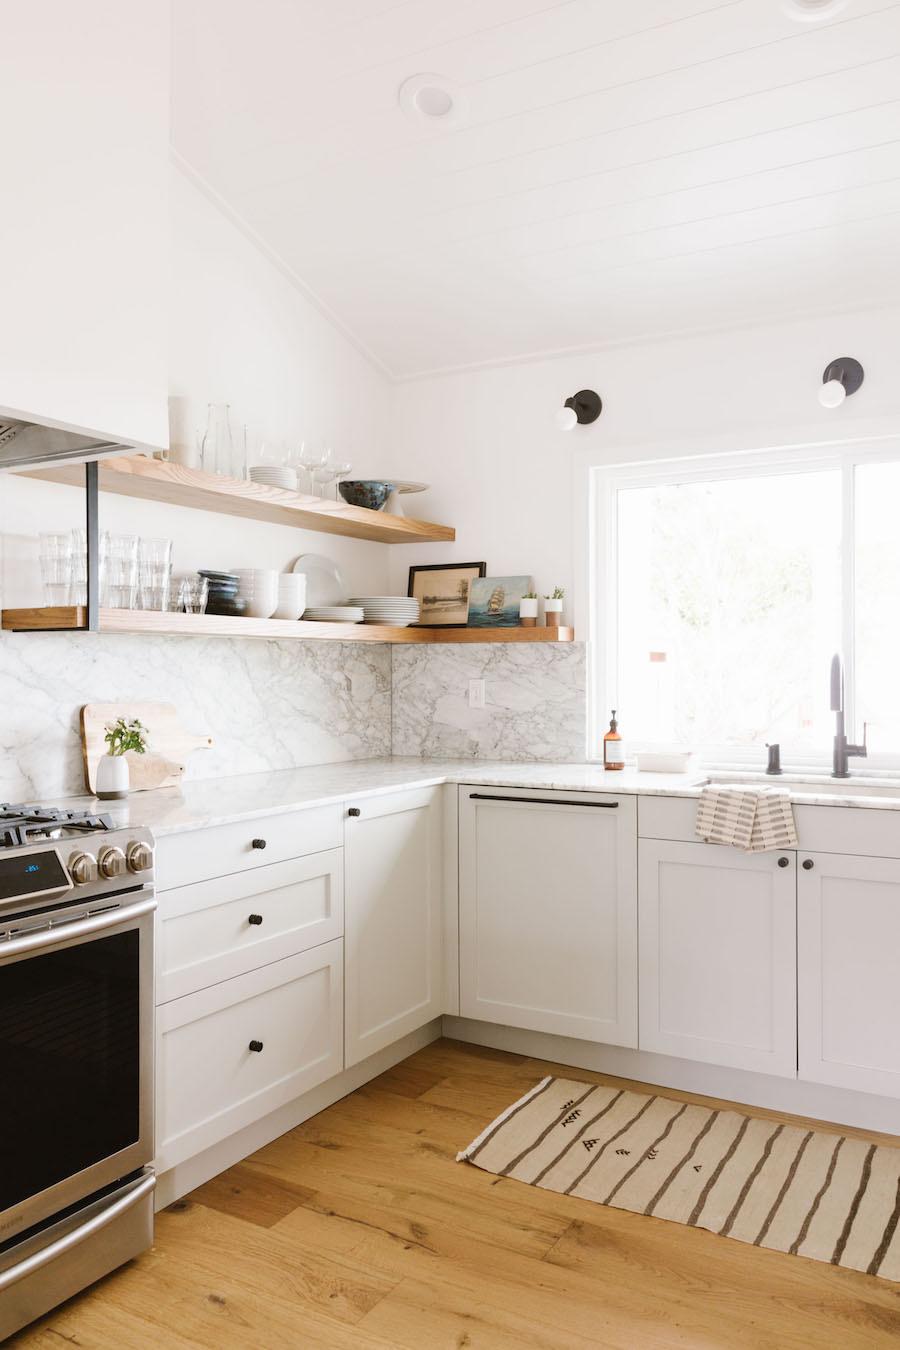 White Marble Backsplash Kitchen Minimal Scandinavian Style In California